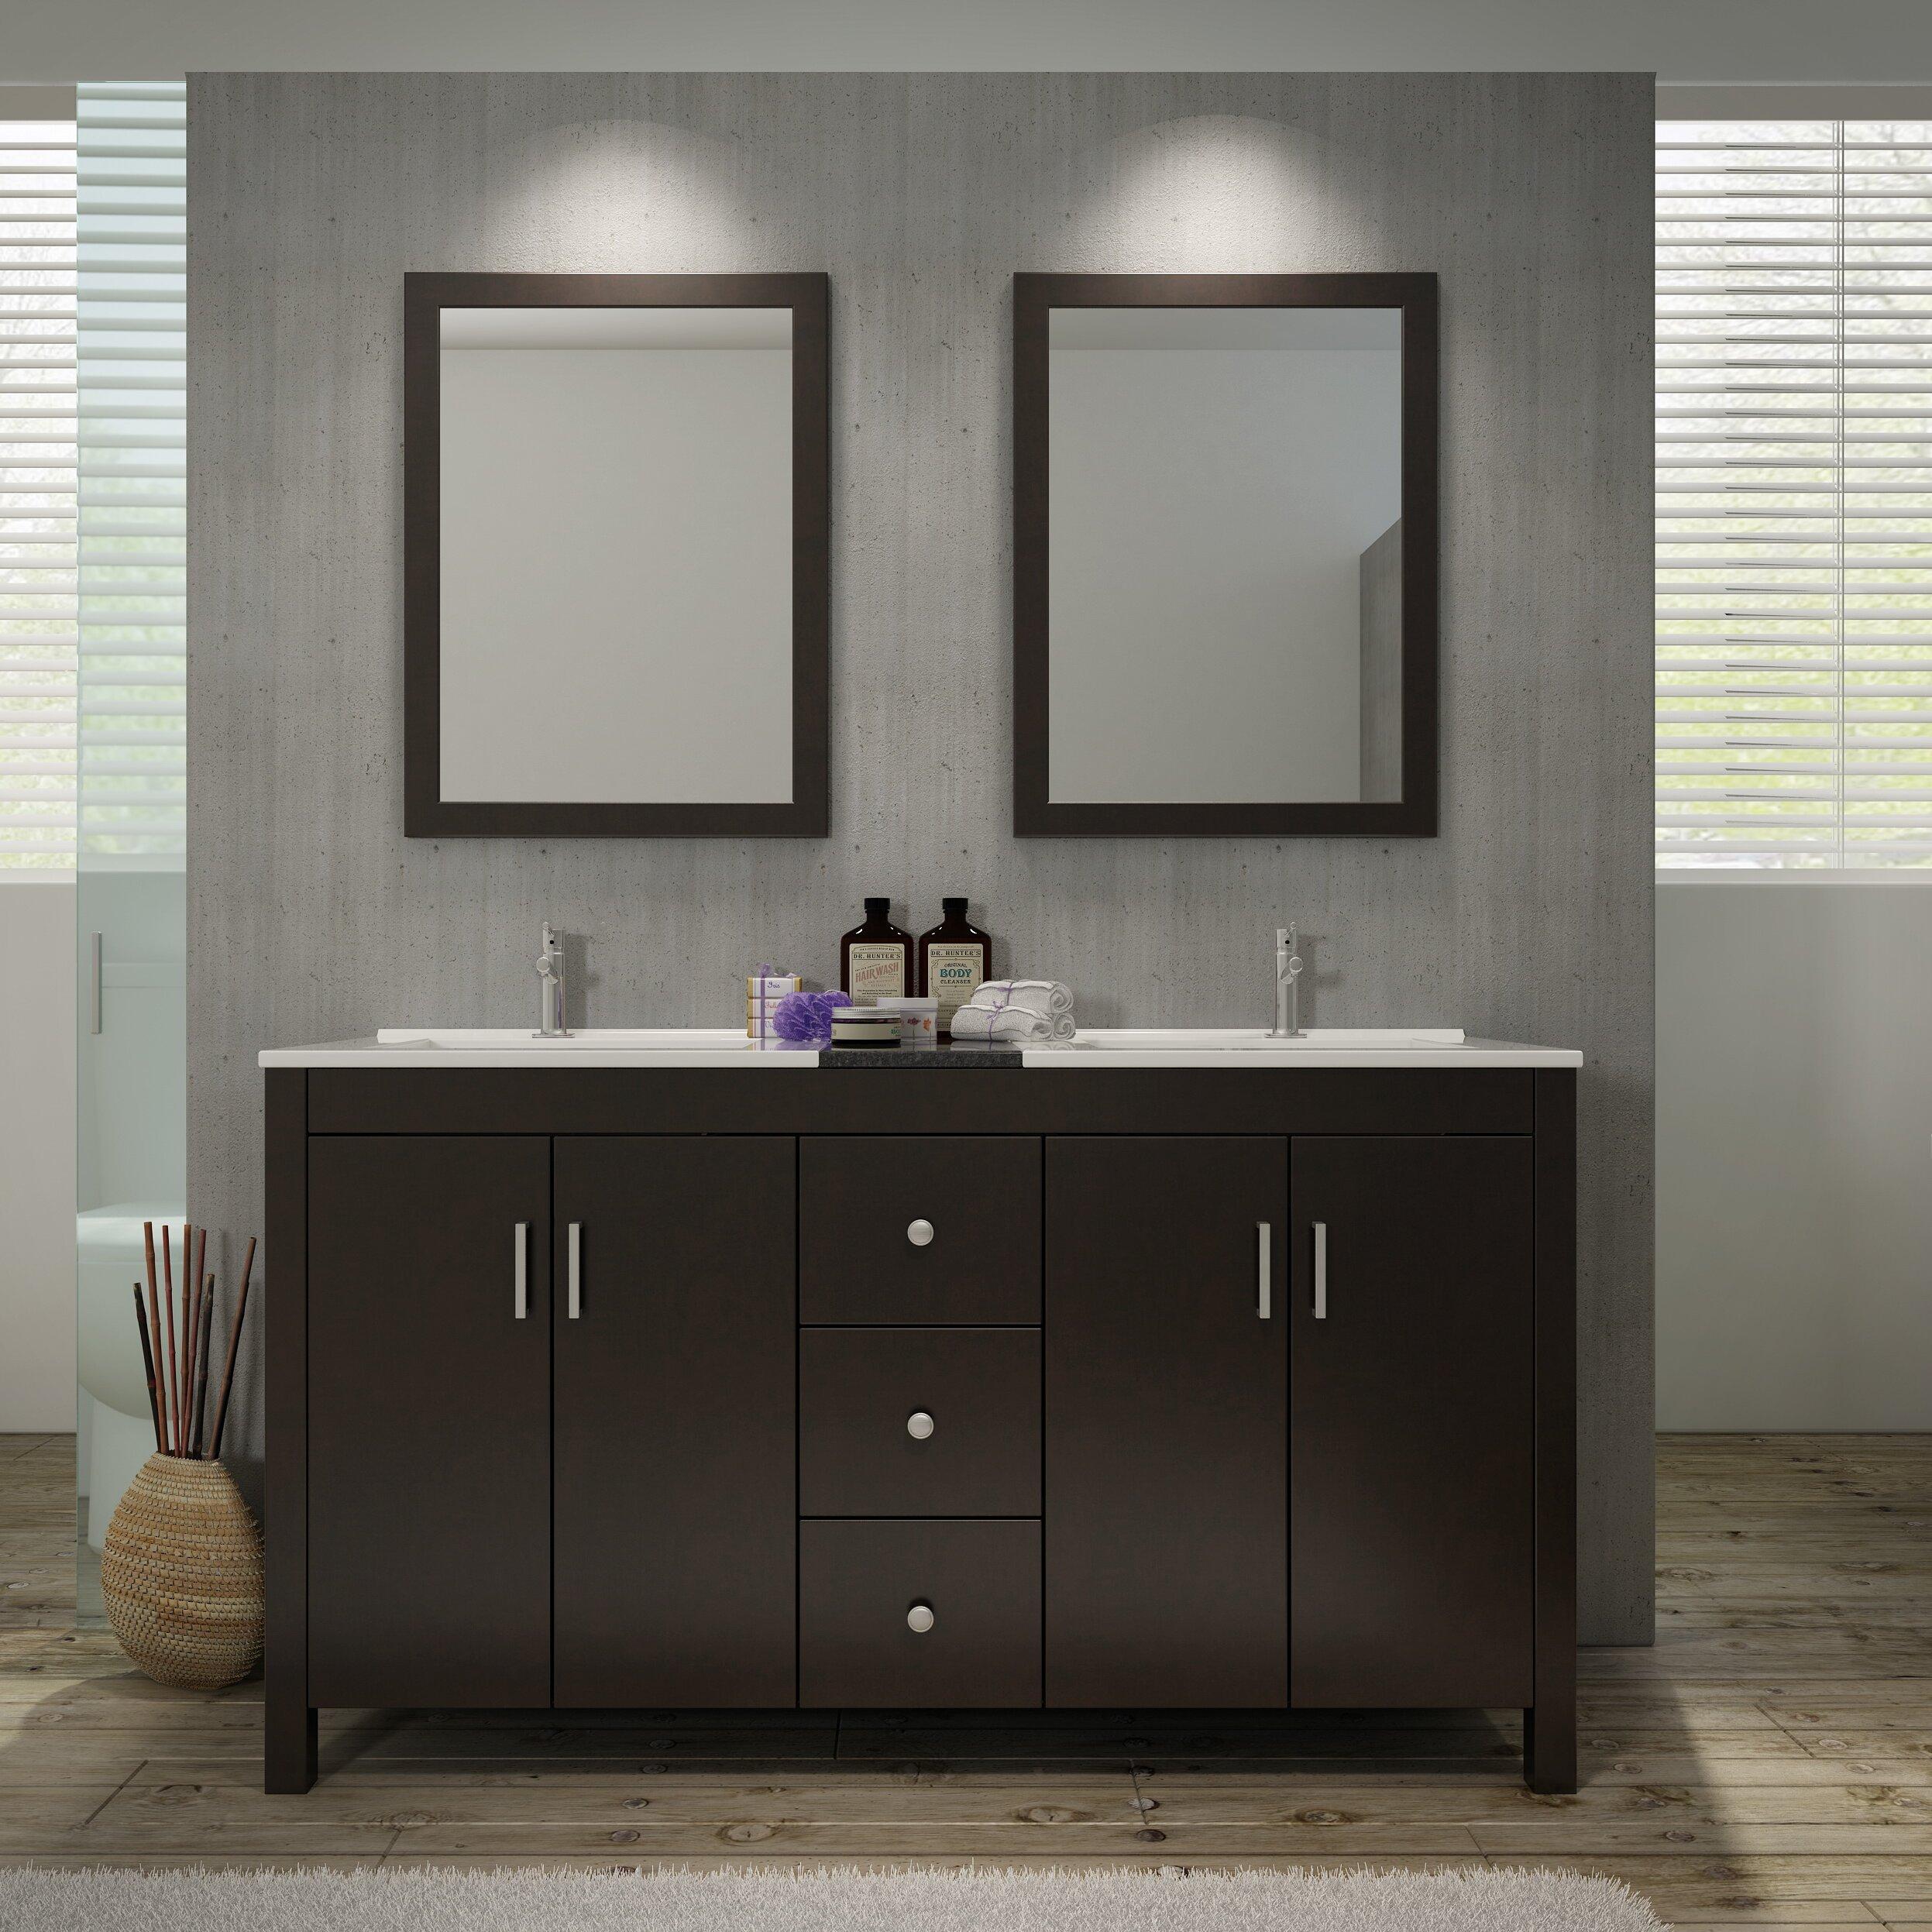 mirrored - Mirrored Bathroom Vanity